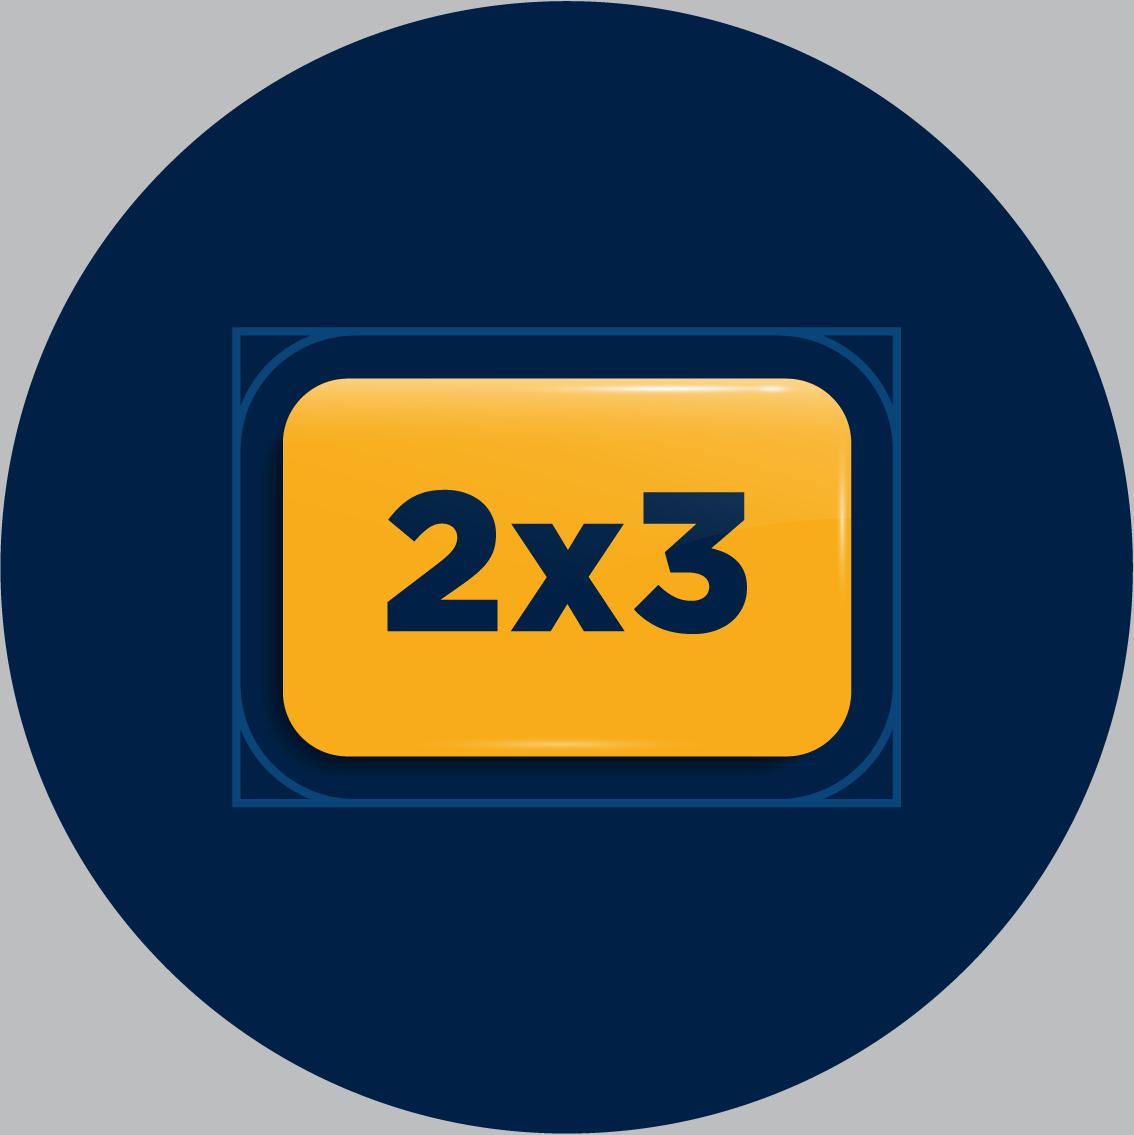 2x3 rectangle custom buttons